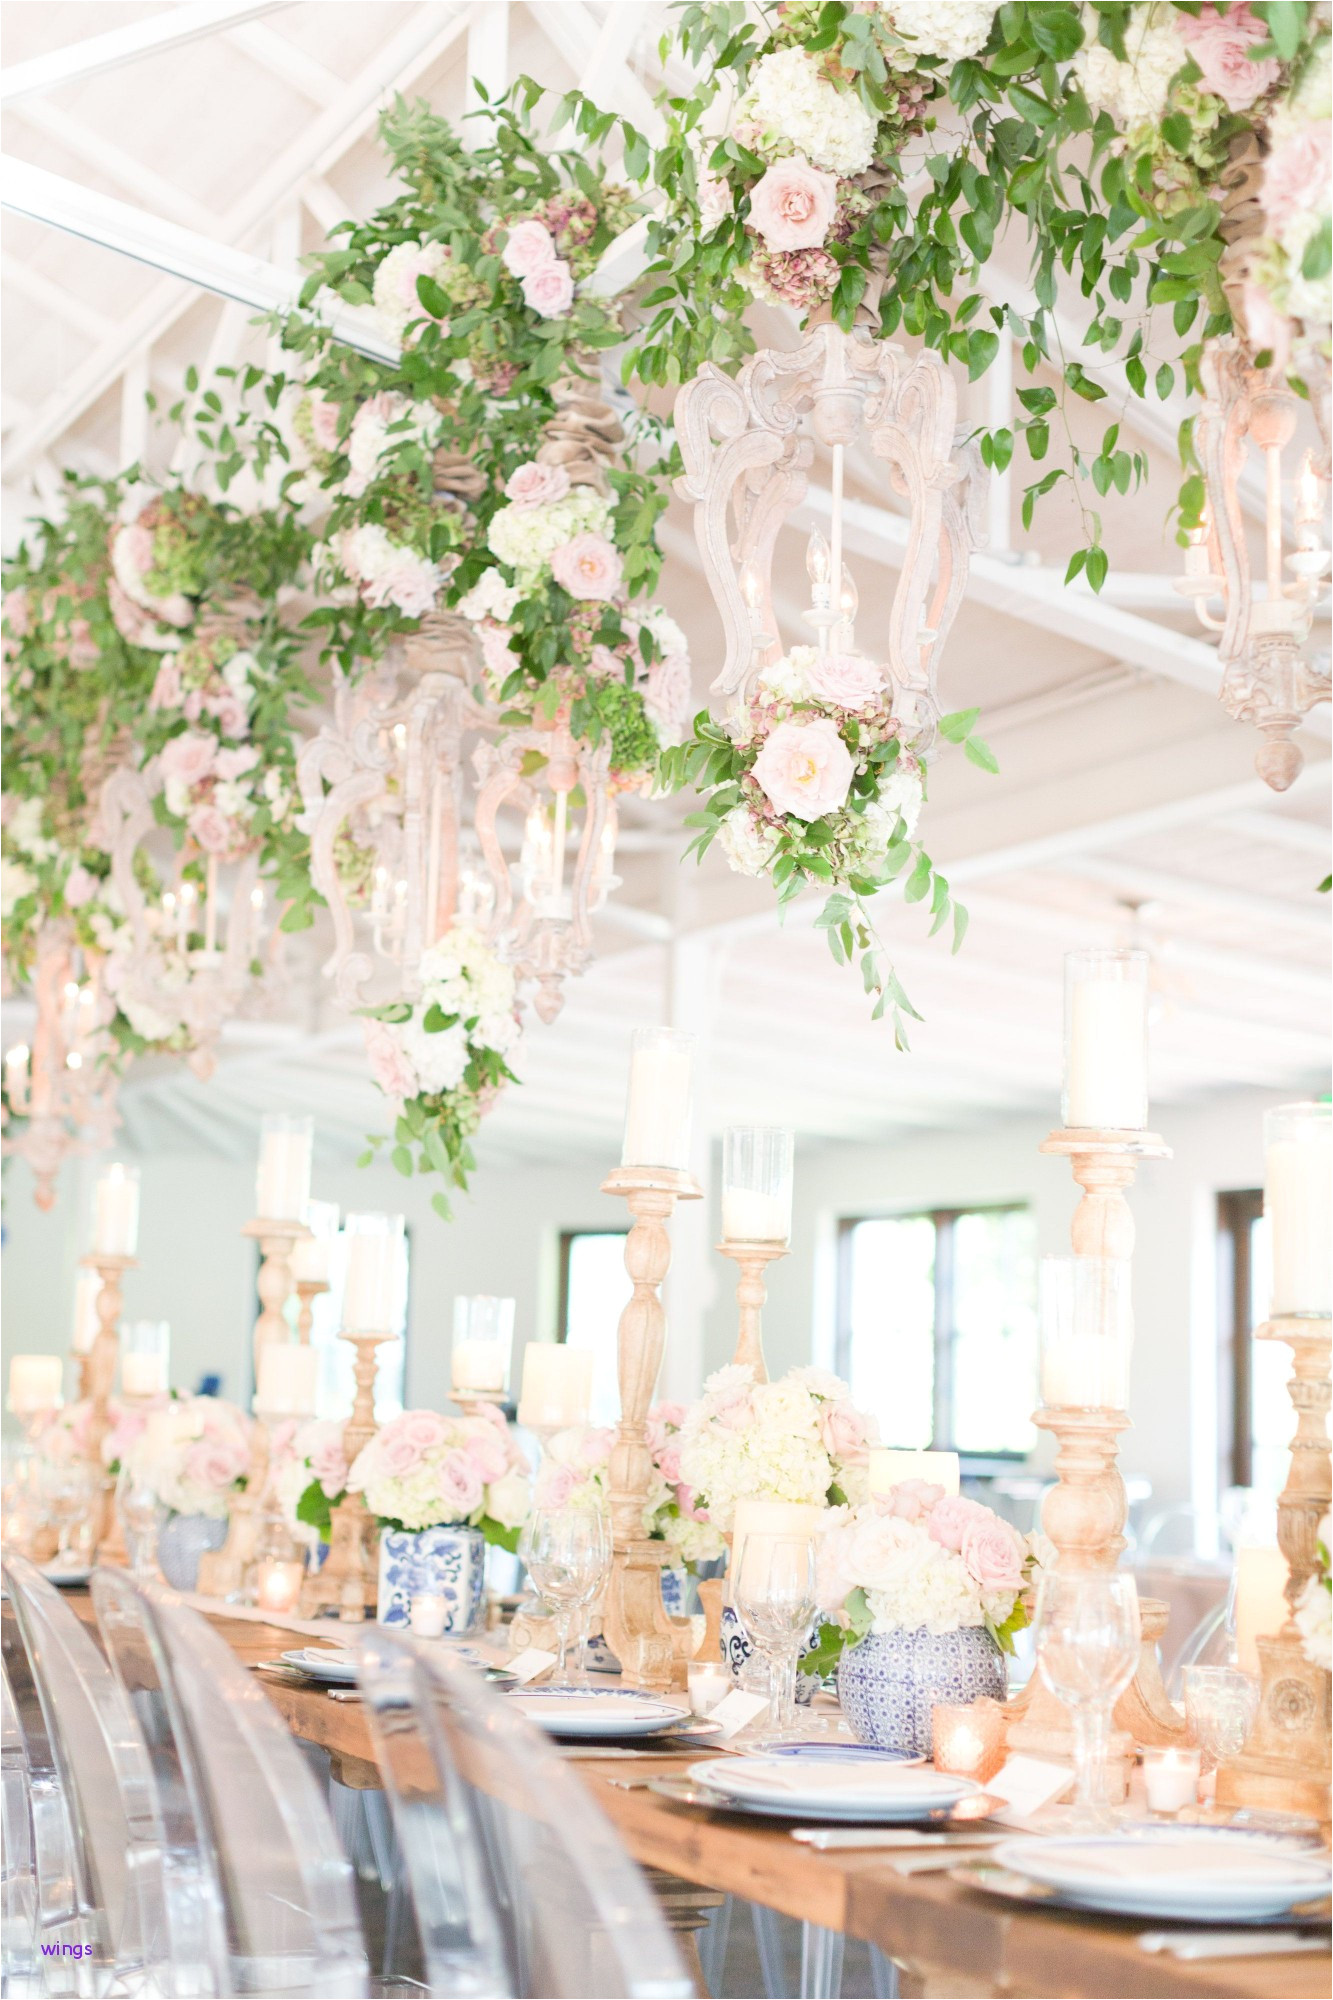 sencillas with para bodas boda de decoracion en casa prar decoracion para bodas tienda de boda decoraciones fascinante